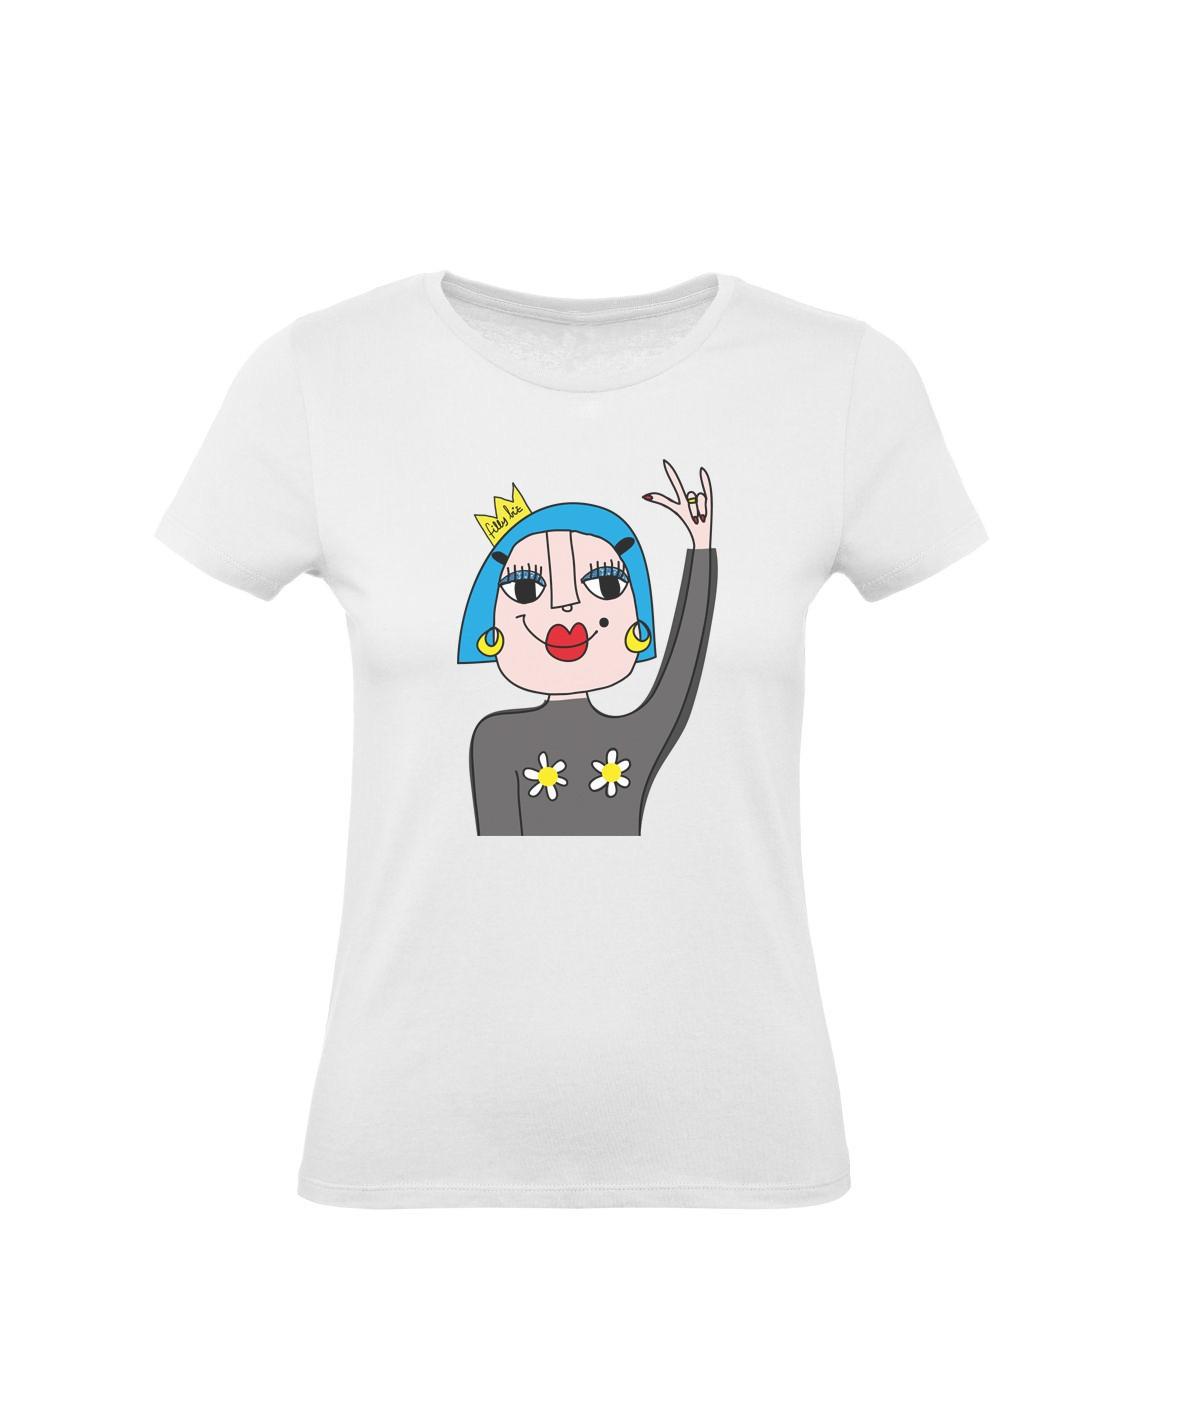 Rock 'n roll ● printed t-shirt